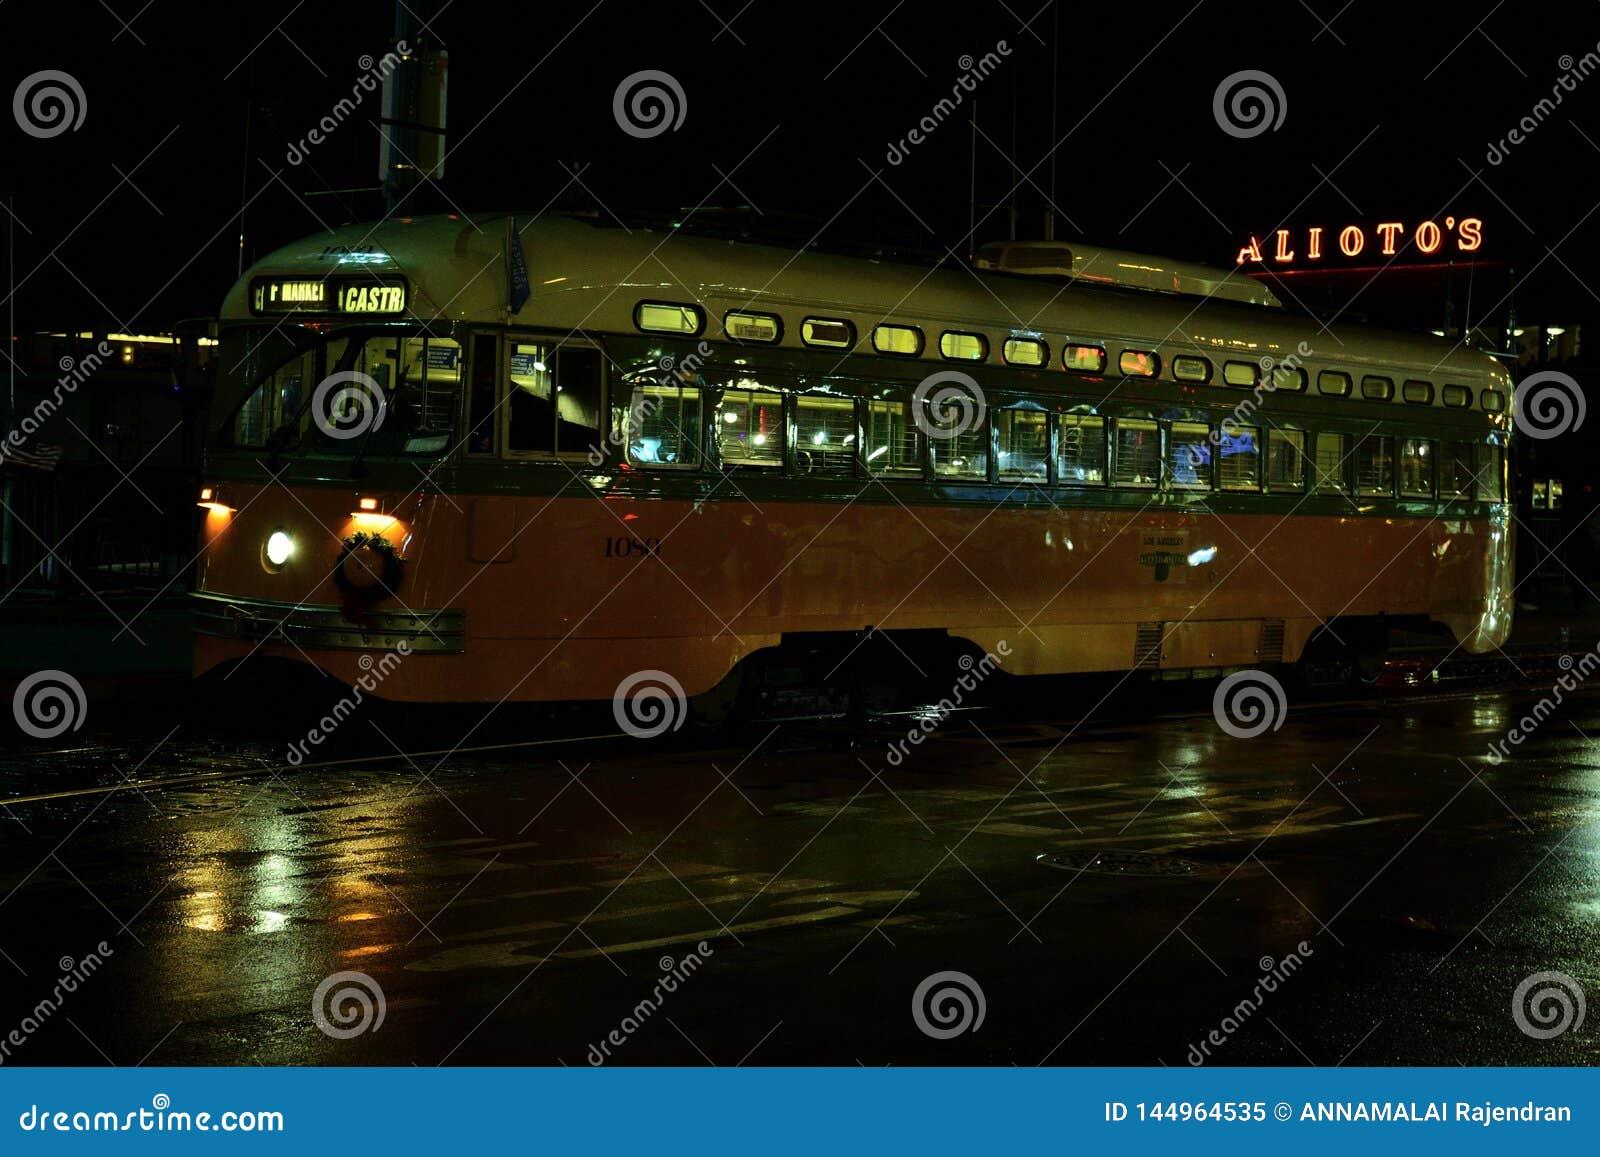 San Francisco Electrical Tram